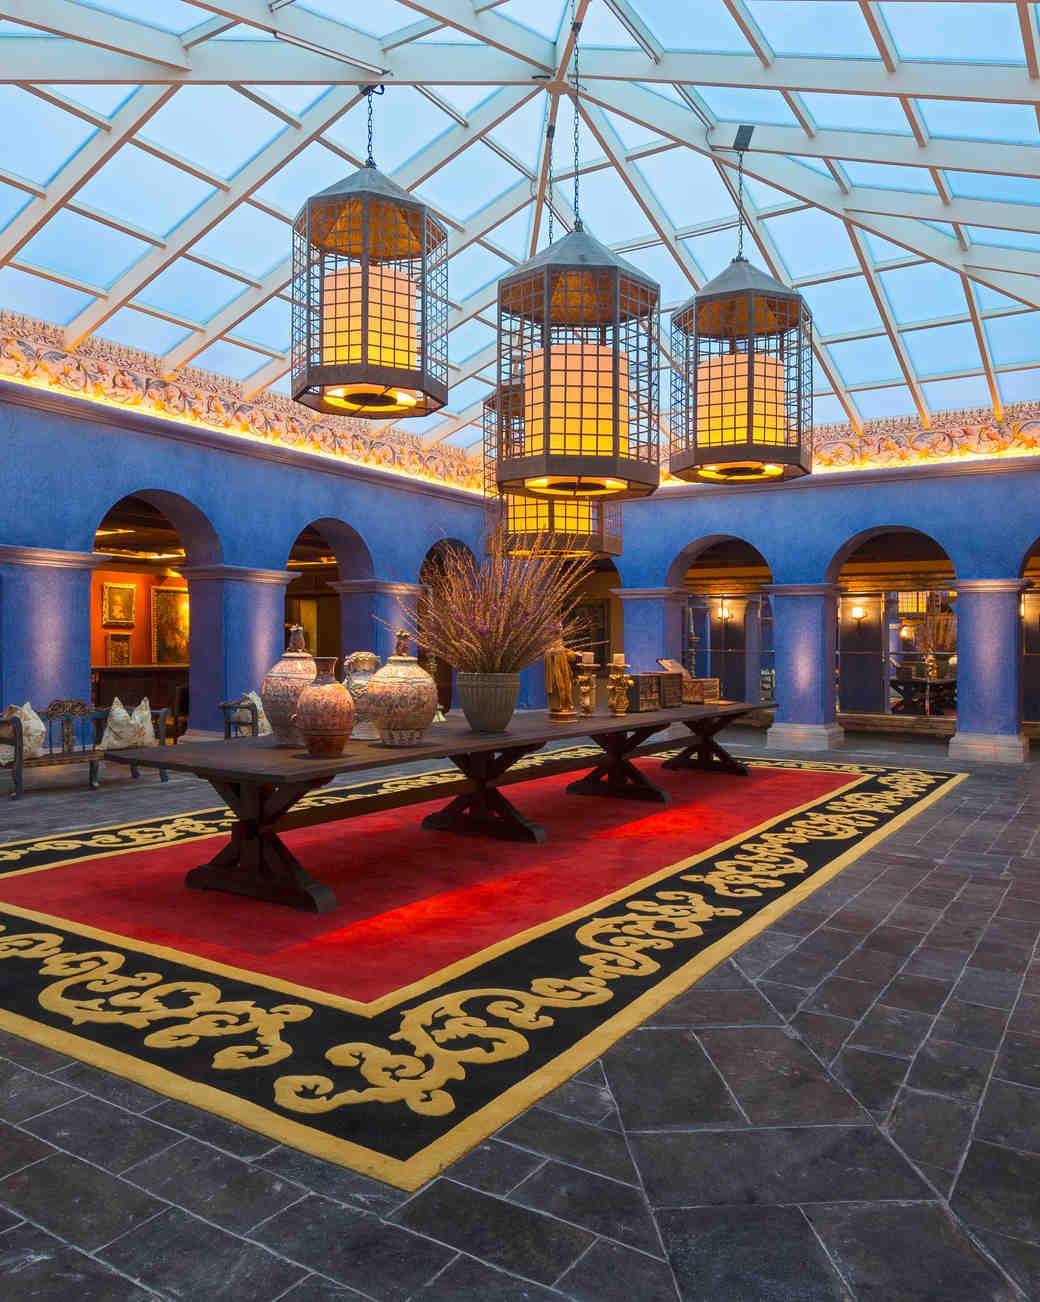 courtney-ben-grinnell-honeymoon-palacio-del-inka-luxury-collection-cusco-peru-0915.jpg